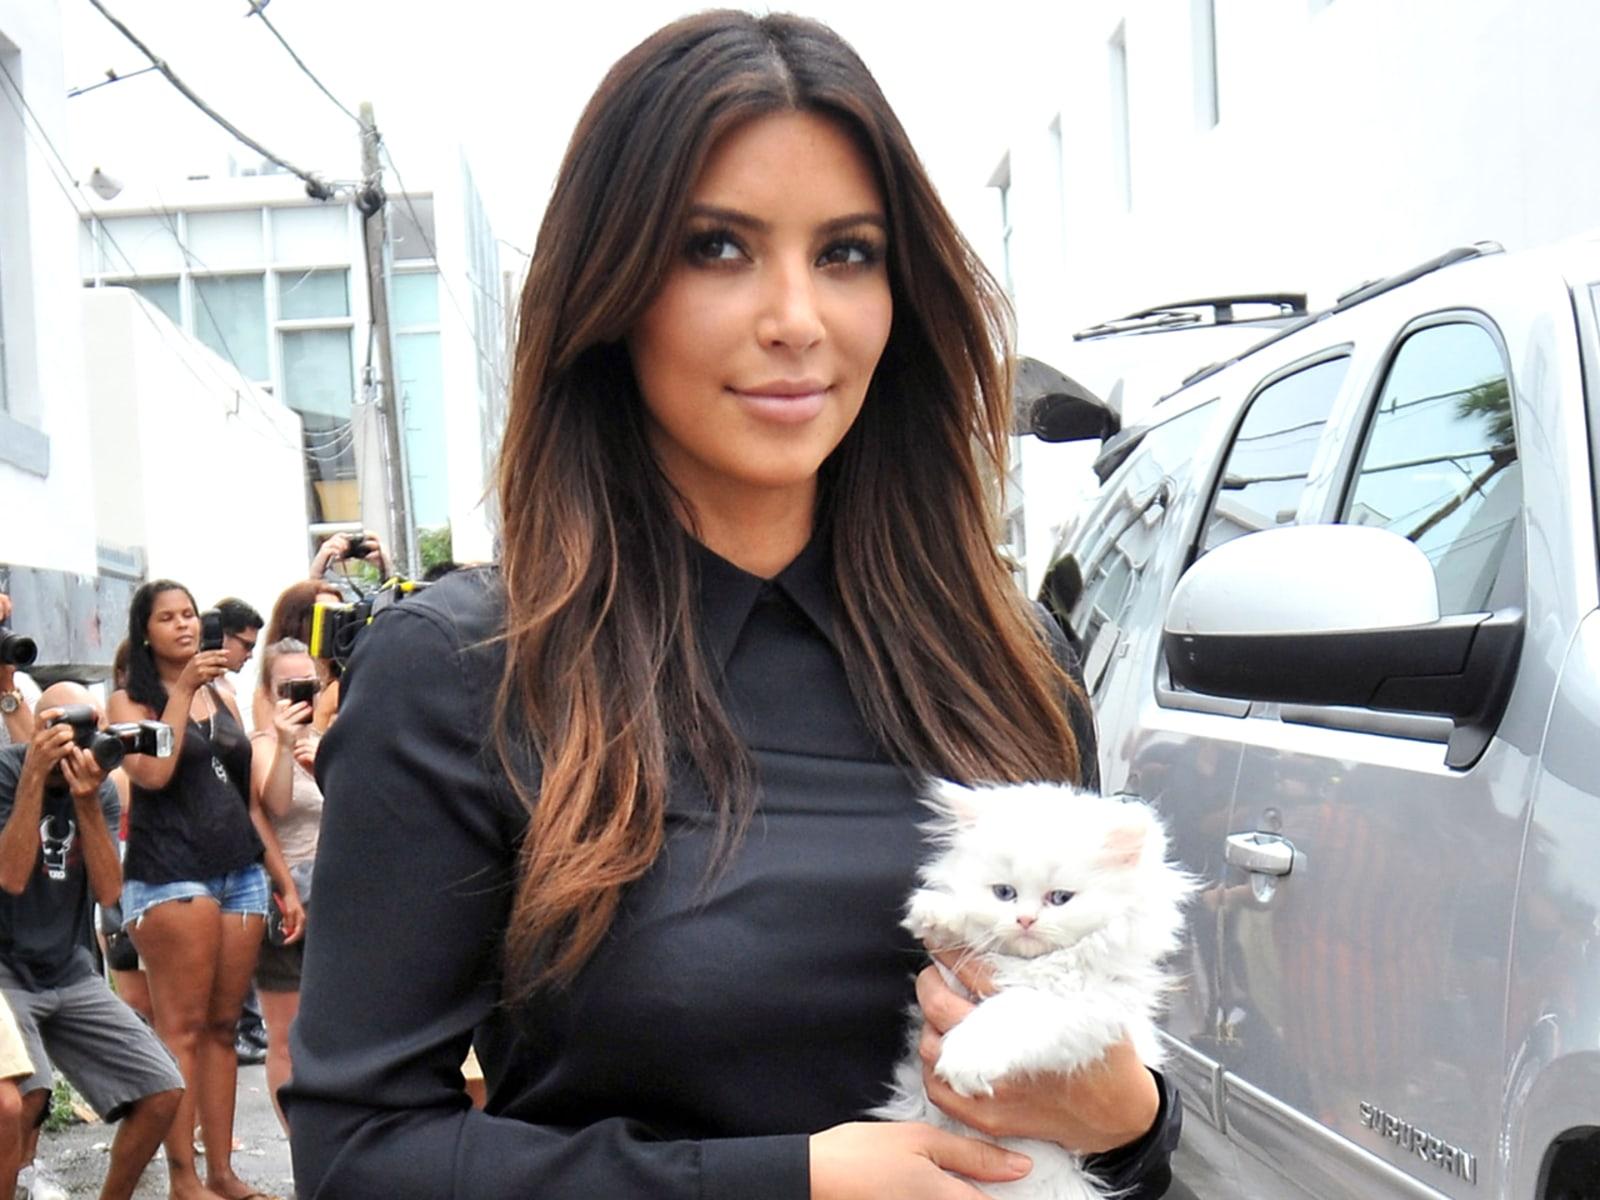 Kim, Kourtney and Khloe Kardashian head to their Miami Dash store with new baby girl Penelope